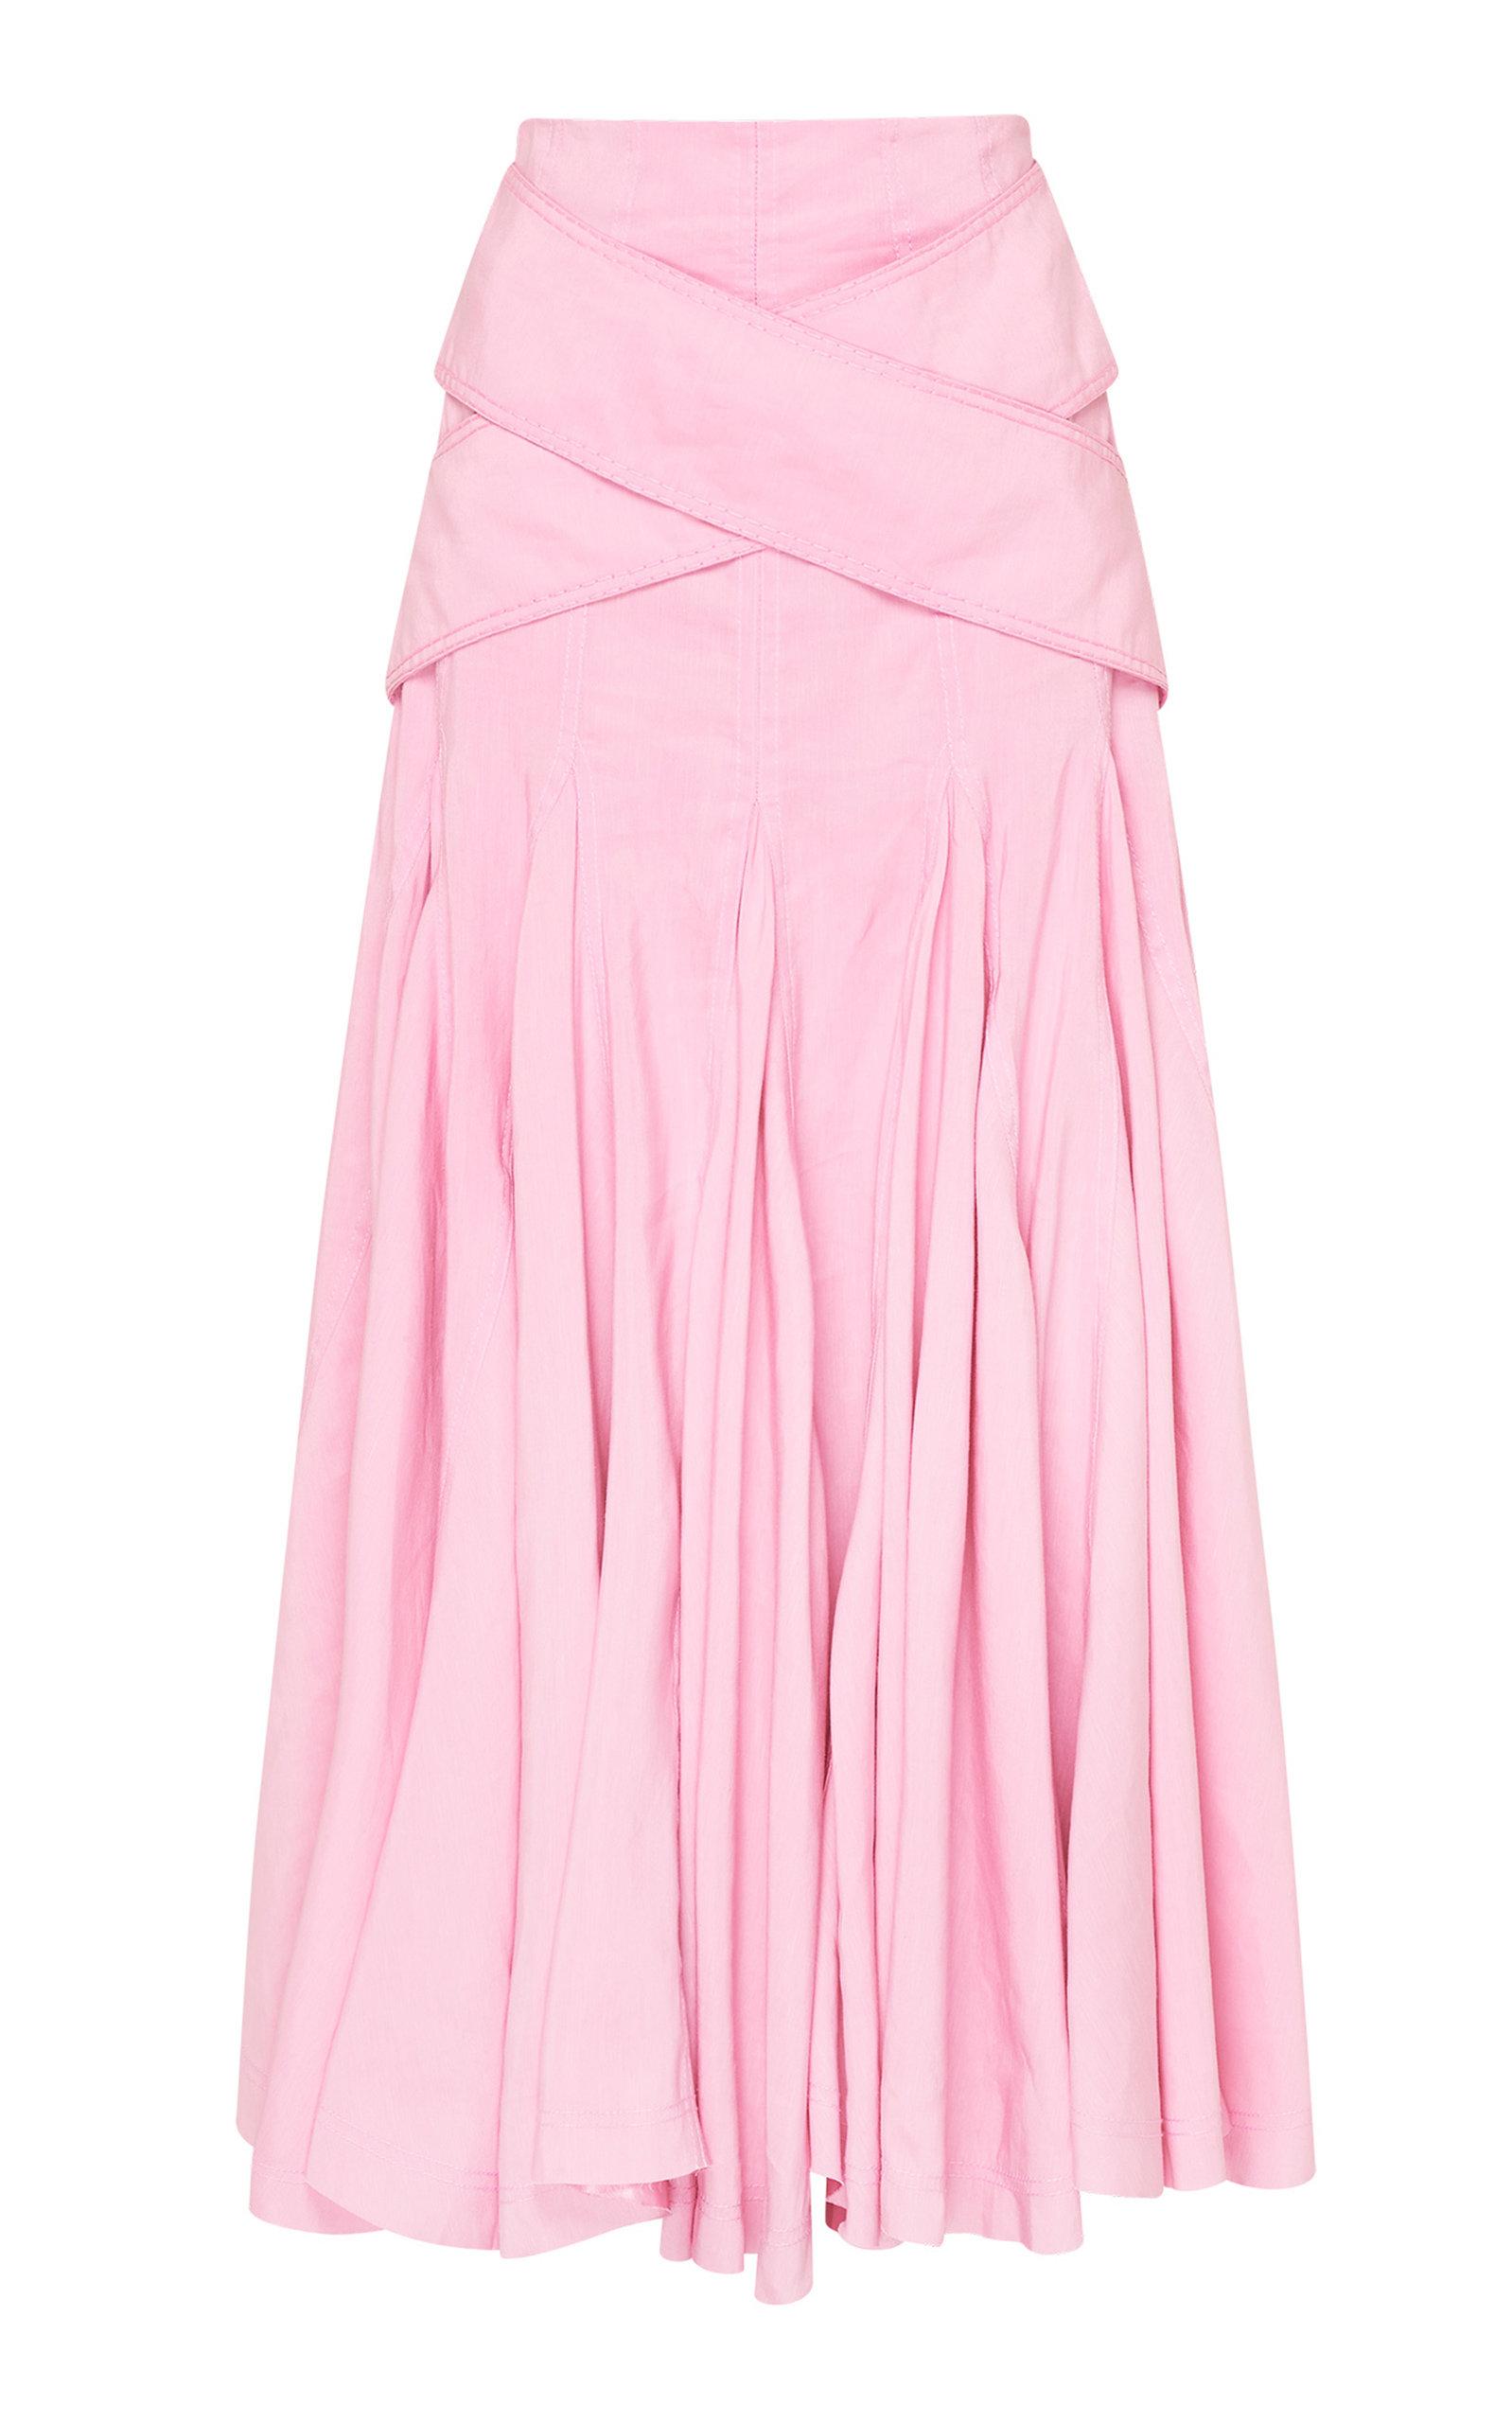 - Women's Serendipity Linen-Blend Midi Skirt